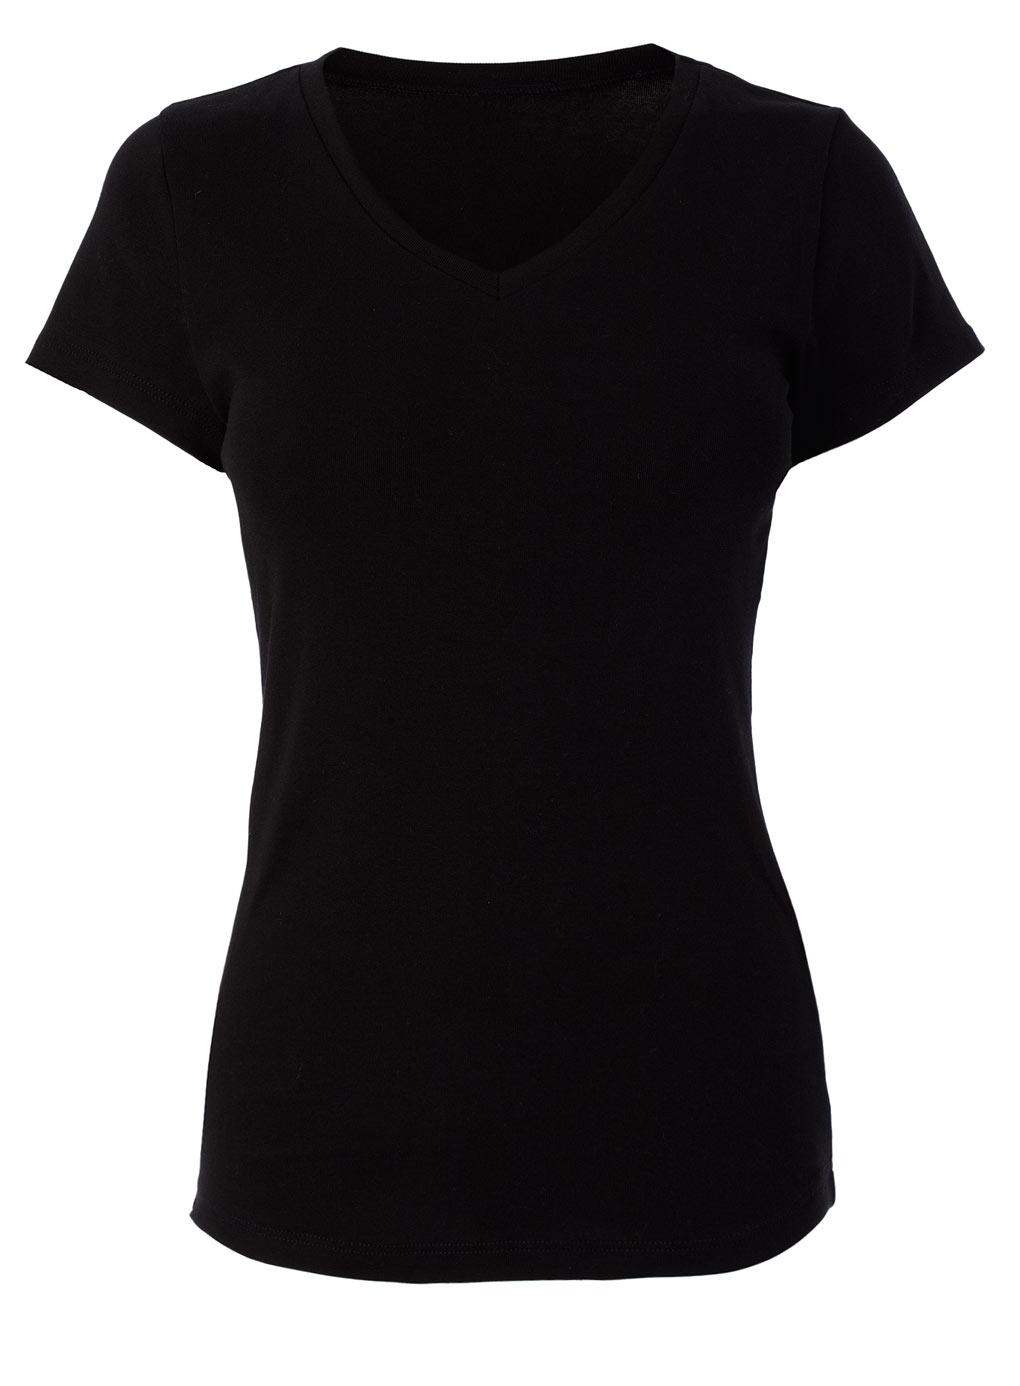 Plain Black Tshirts Clipart Best